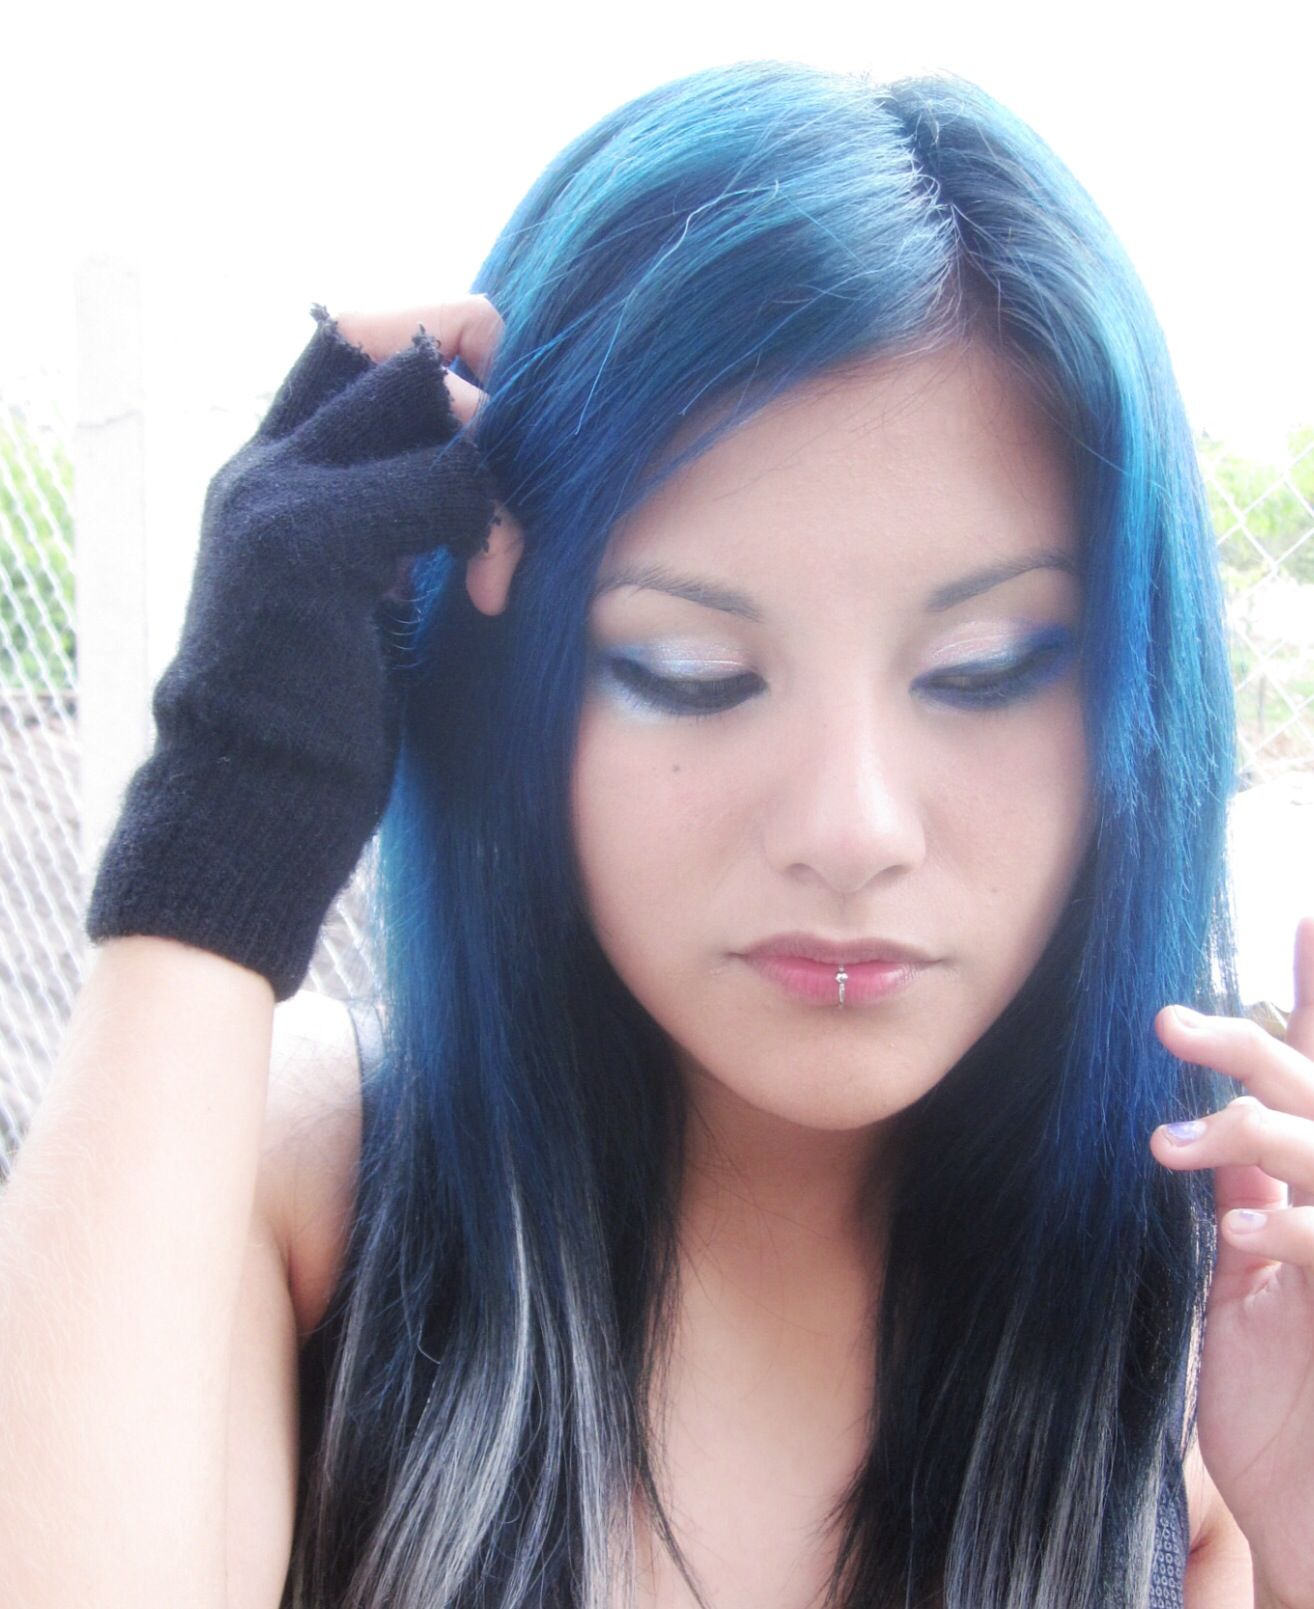 Pin By Nosheen On Hair Kool Aid Hair Kool Aid Hair Dye Dyed Hair